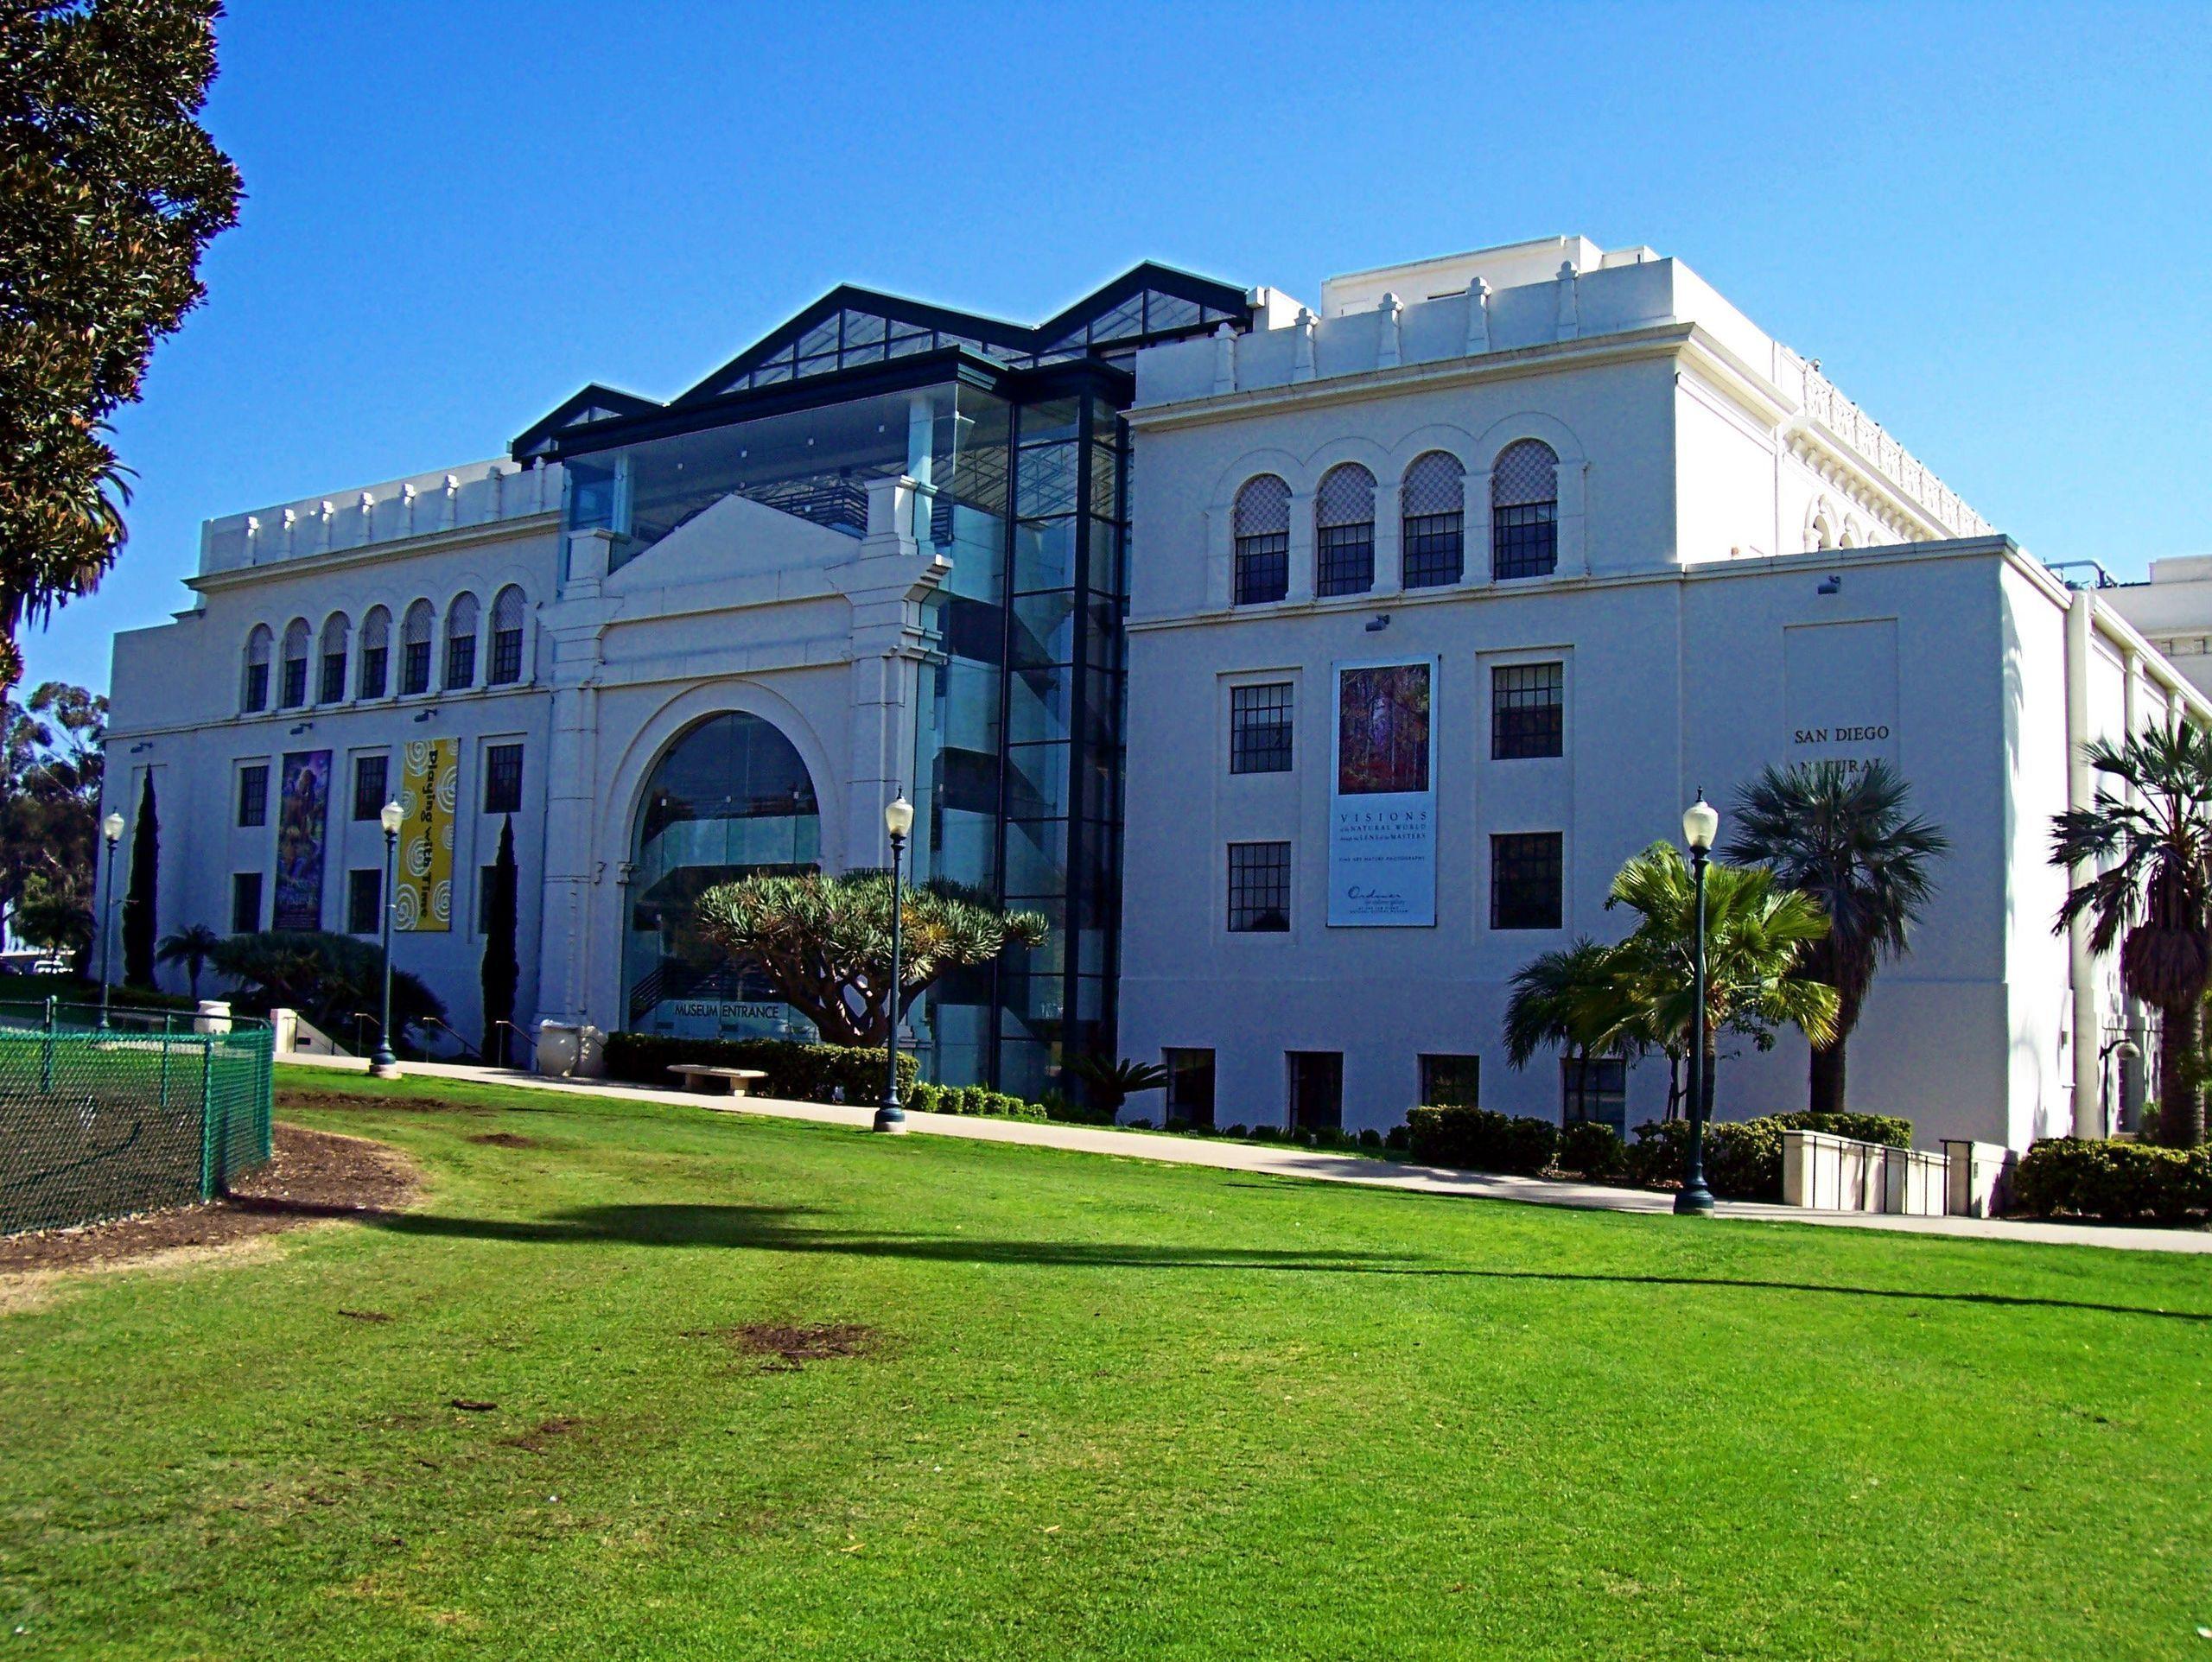 San_Diego_Natural_History_Museum,_Balboa_Park